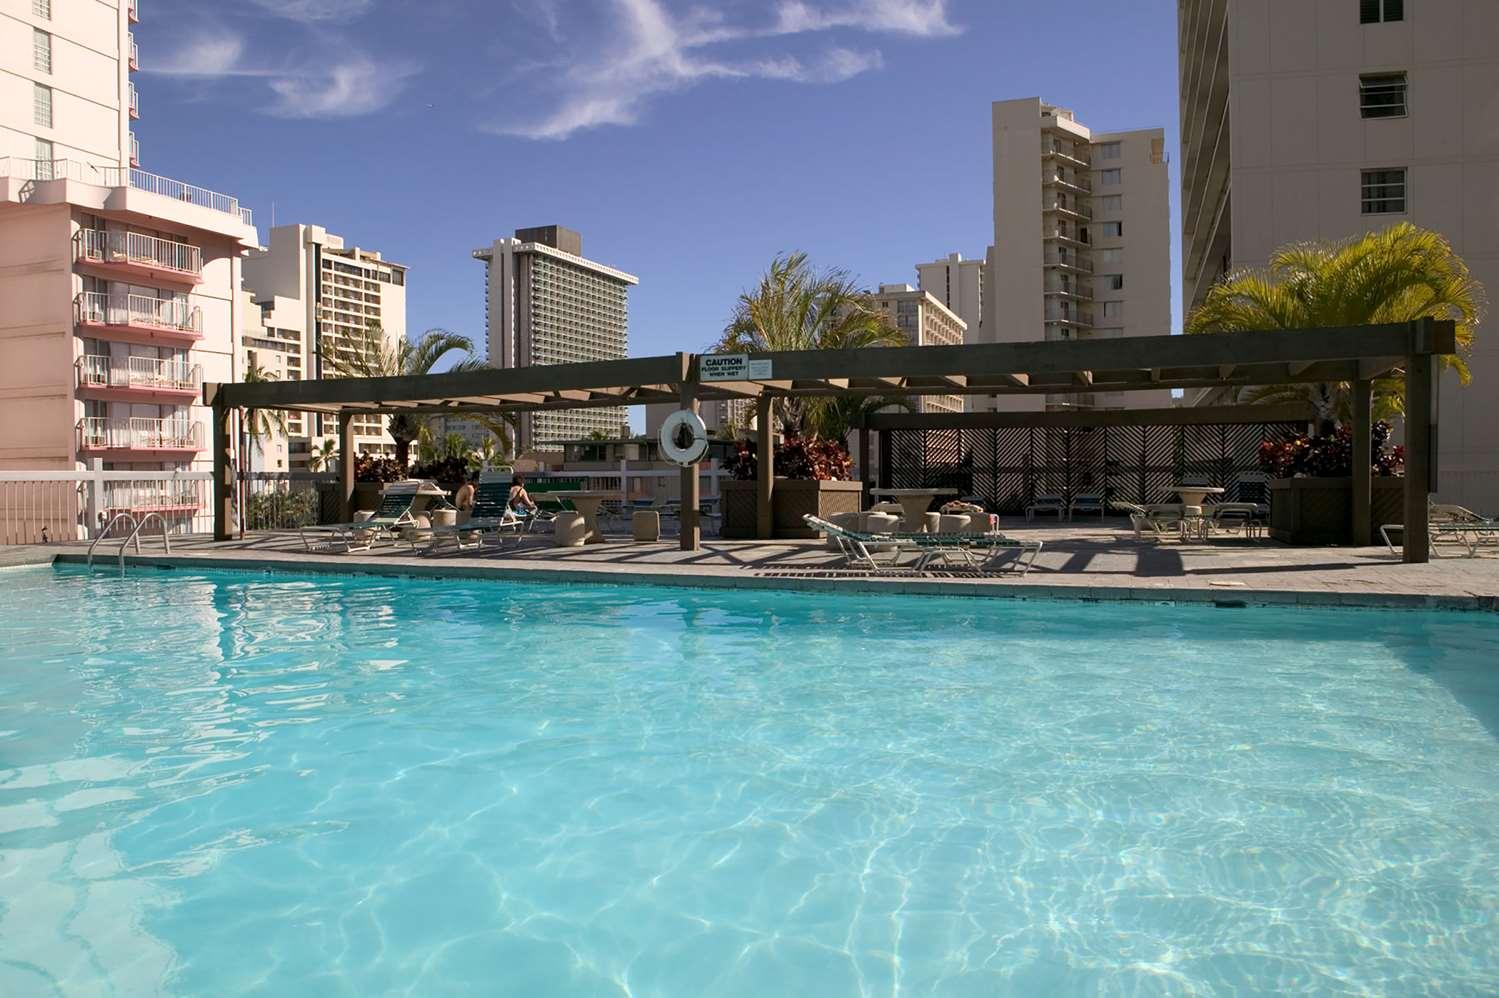 Pool - Aqua Skyline at Island Colony Hotel Waikiki Honolulu